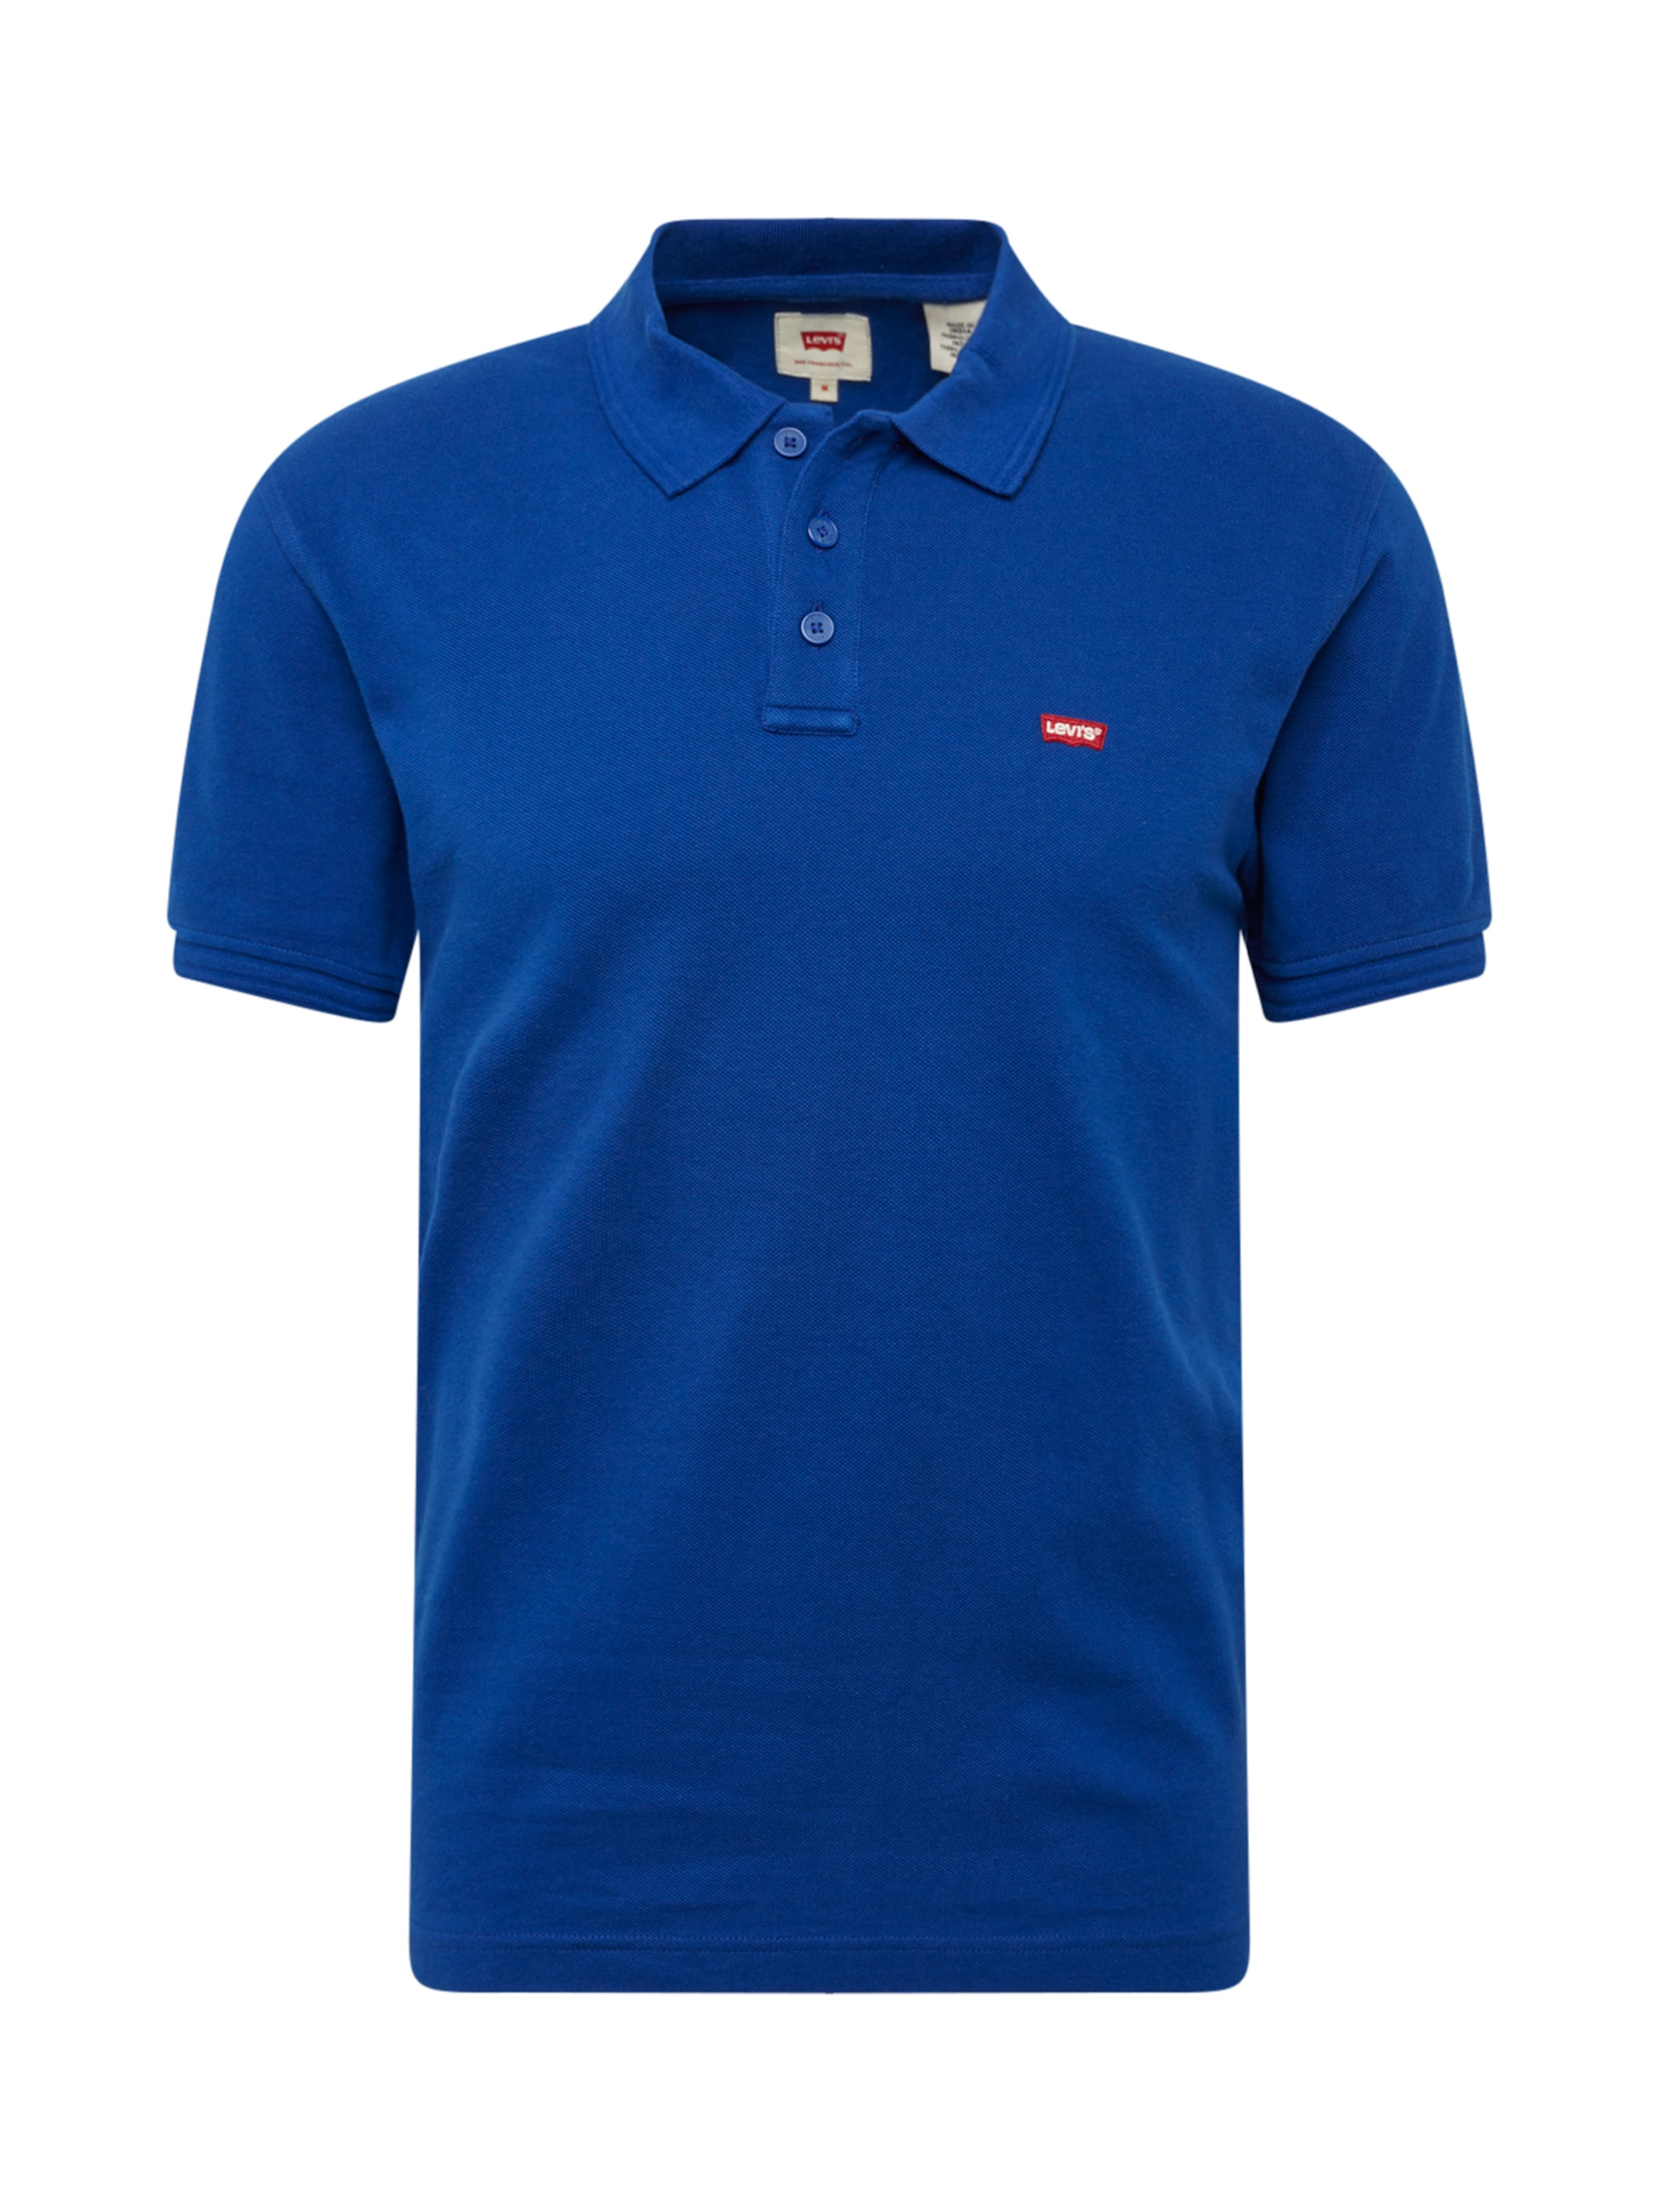 Poloshirt In Blau Levi's Levi's 'housemark' sxtQrdhC